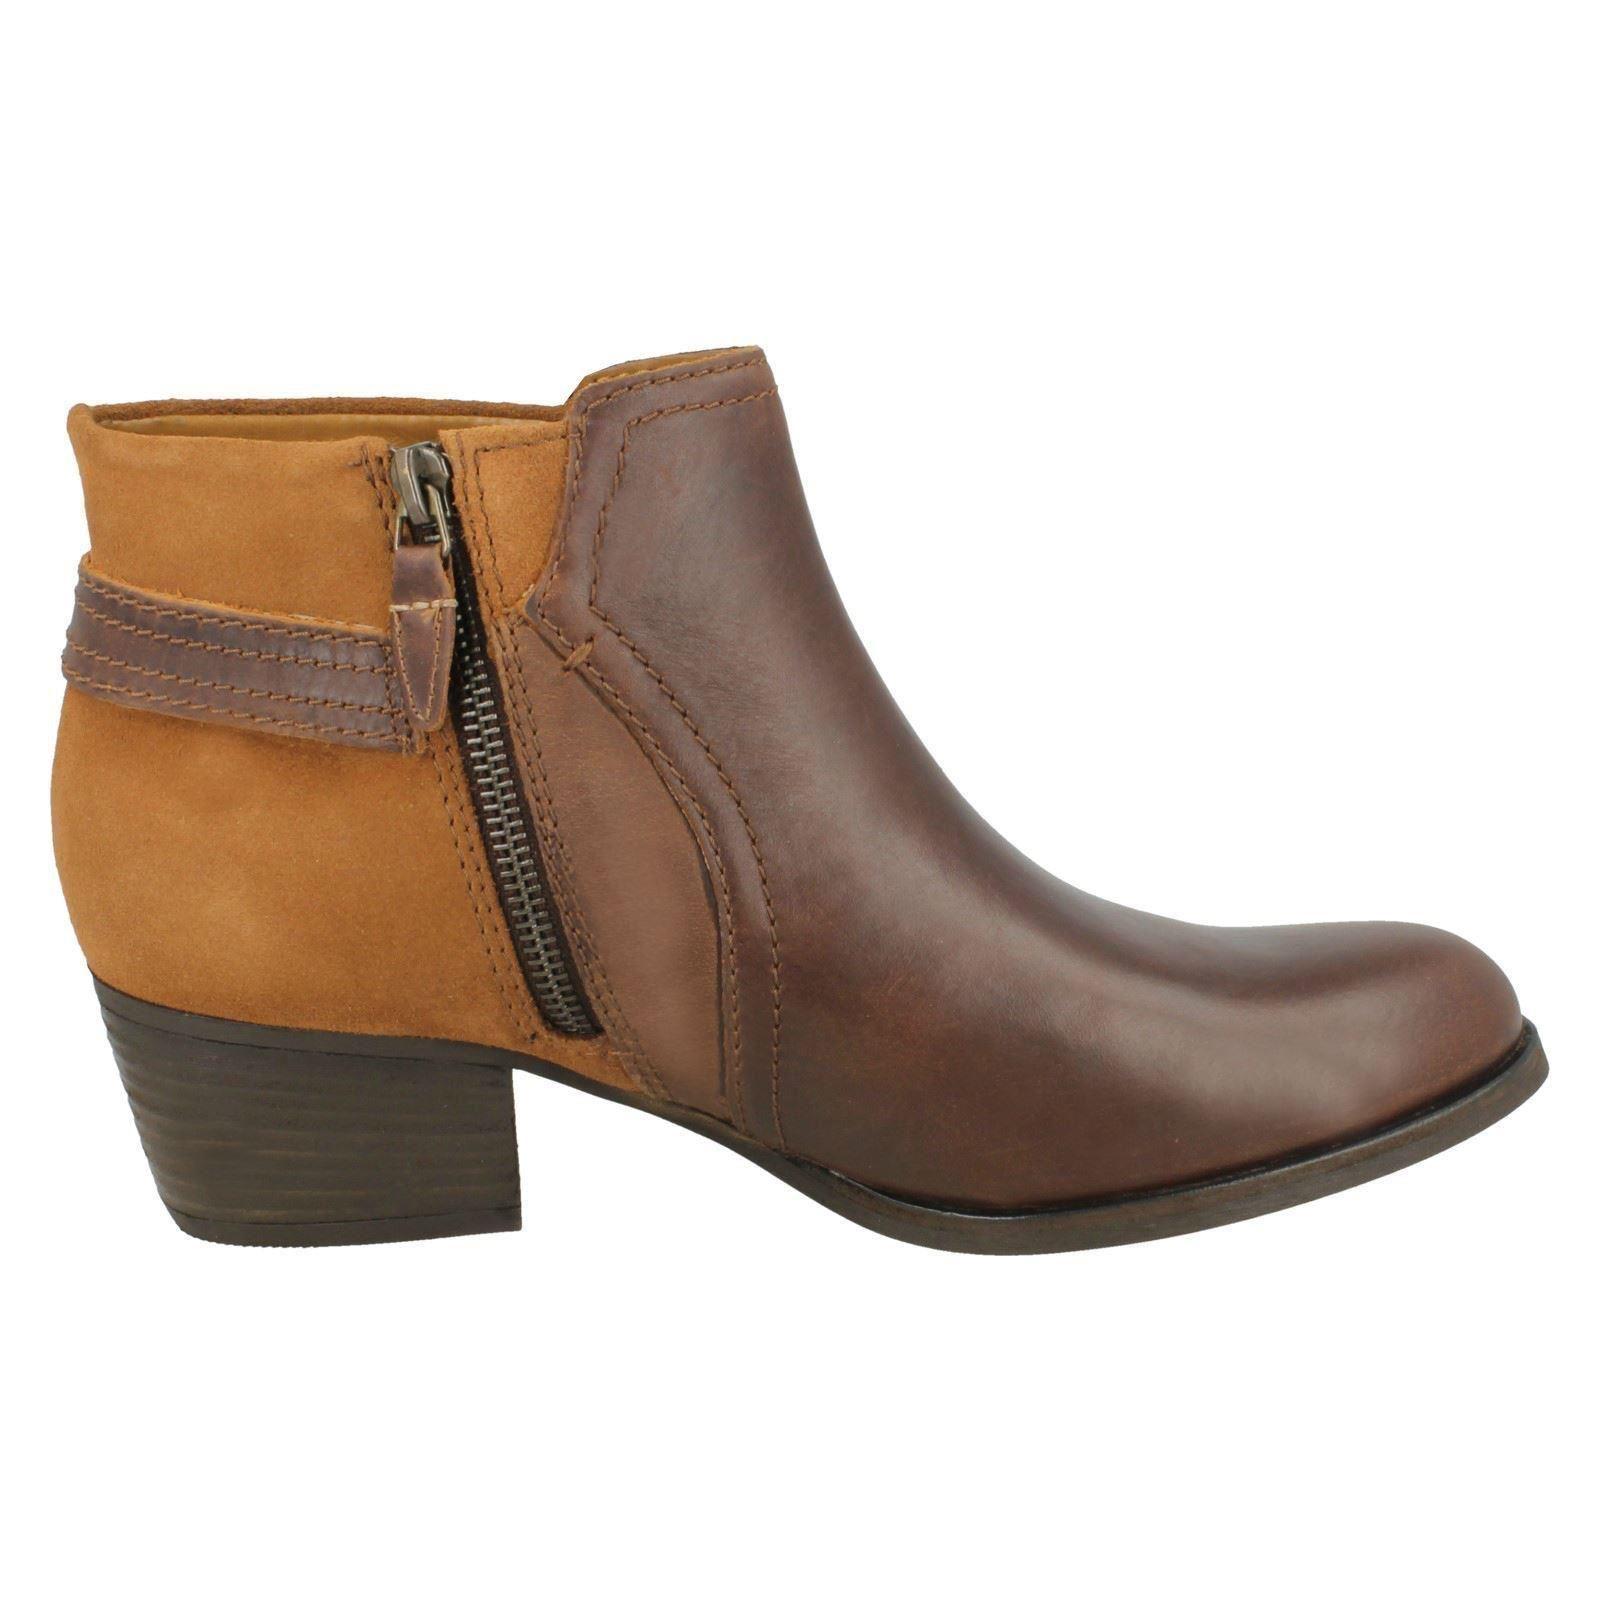 Clarks Damas botas maypearl al Tobillo maypearl botas púrpura 8793dc